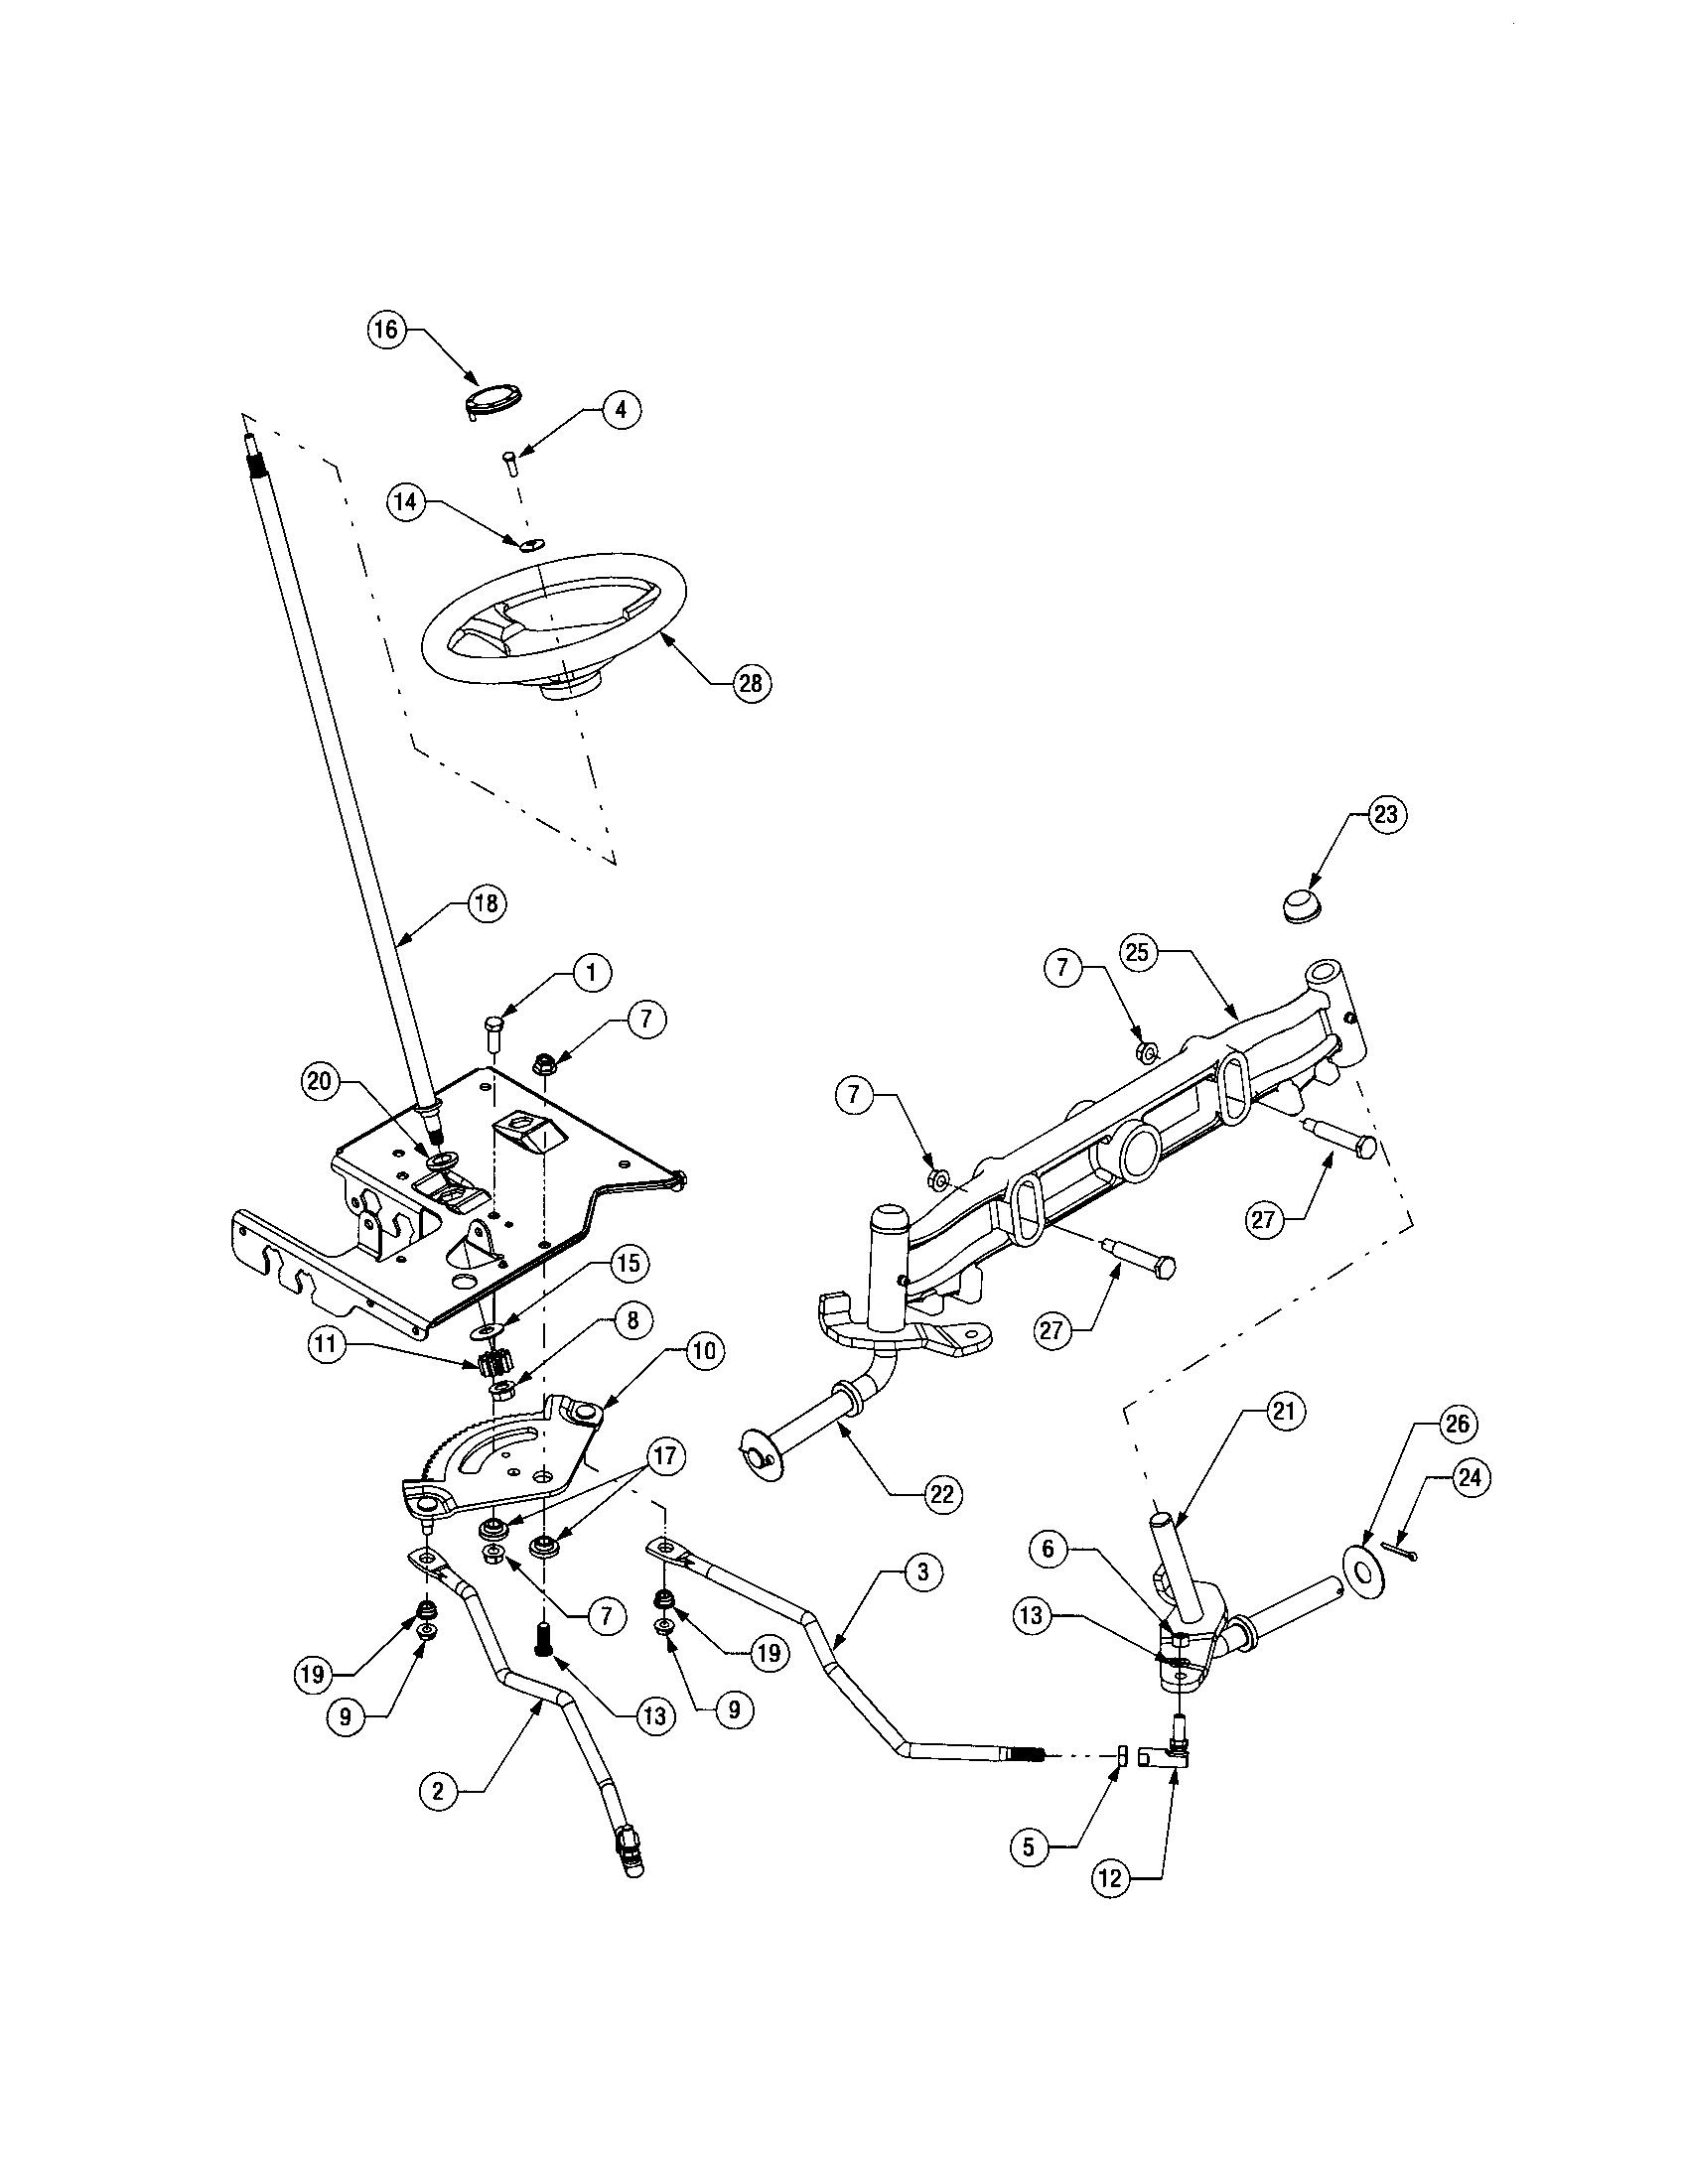 STEERING Diagram & Parts List for Model 13AX60RG744 Toro